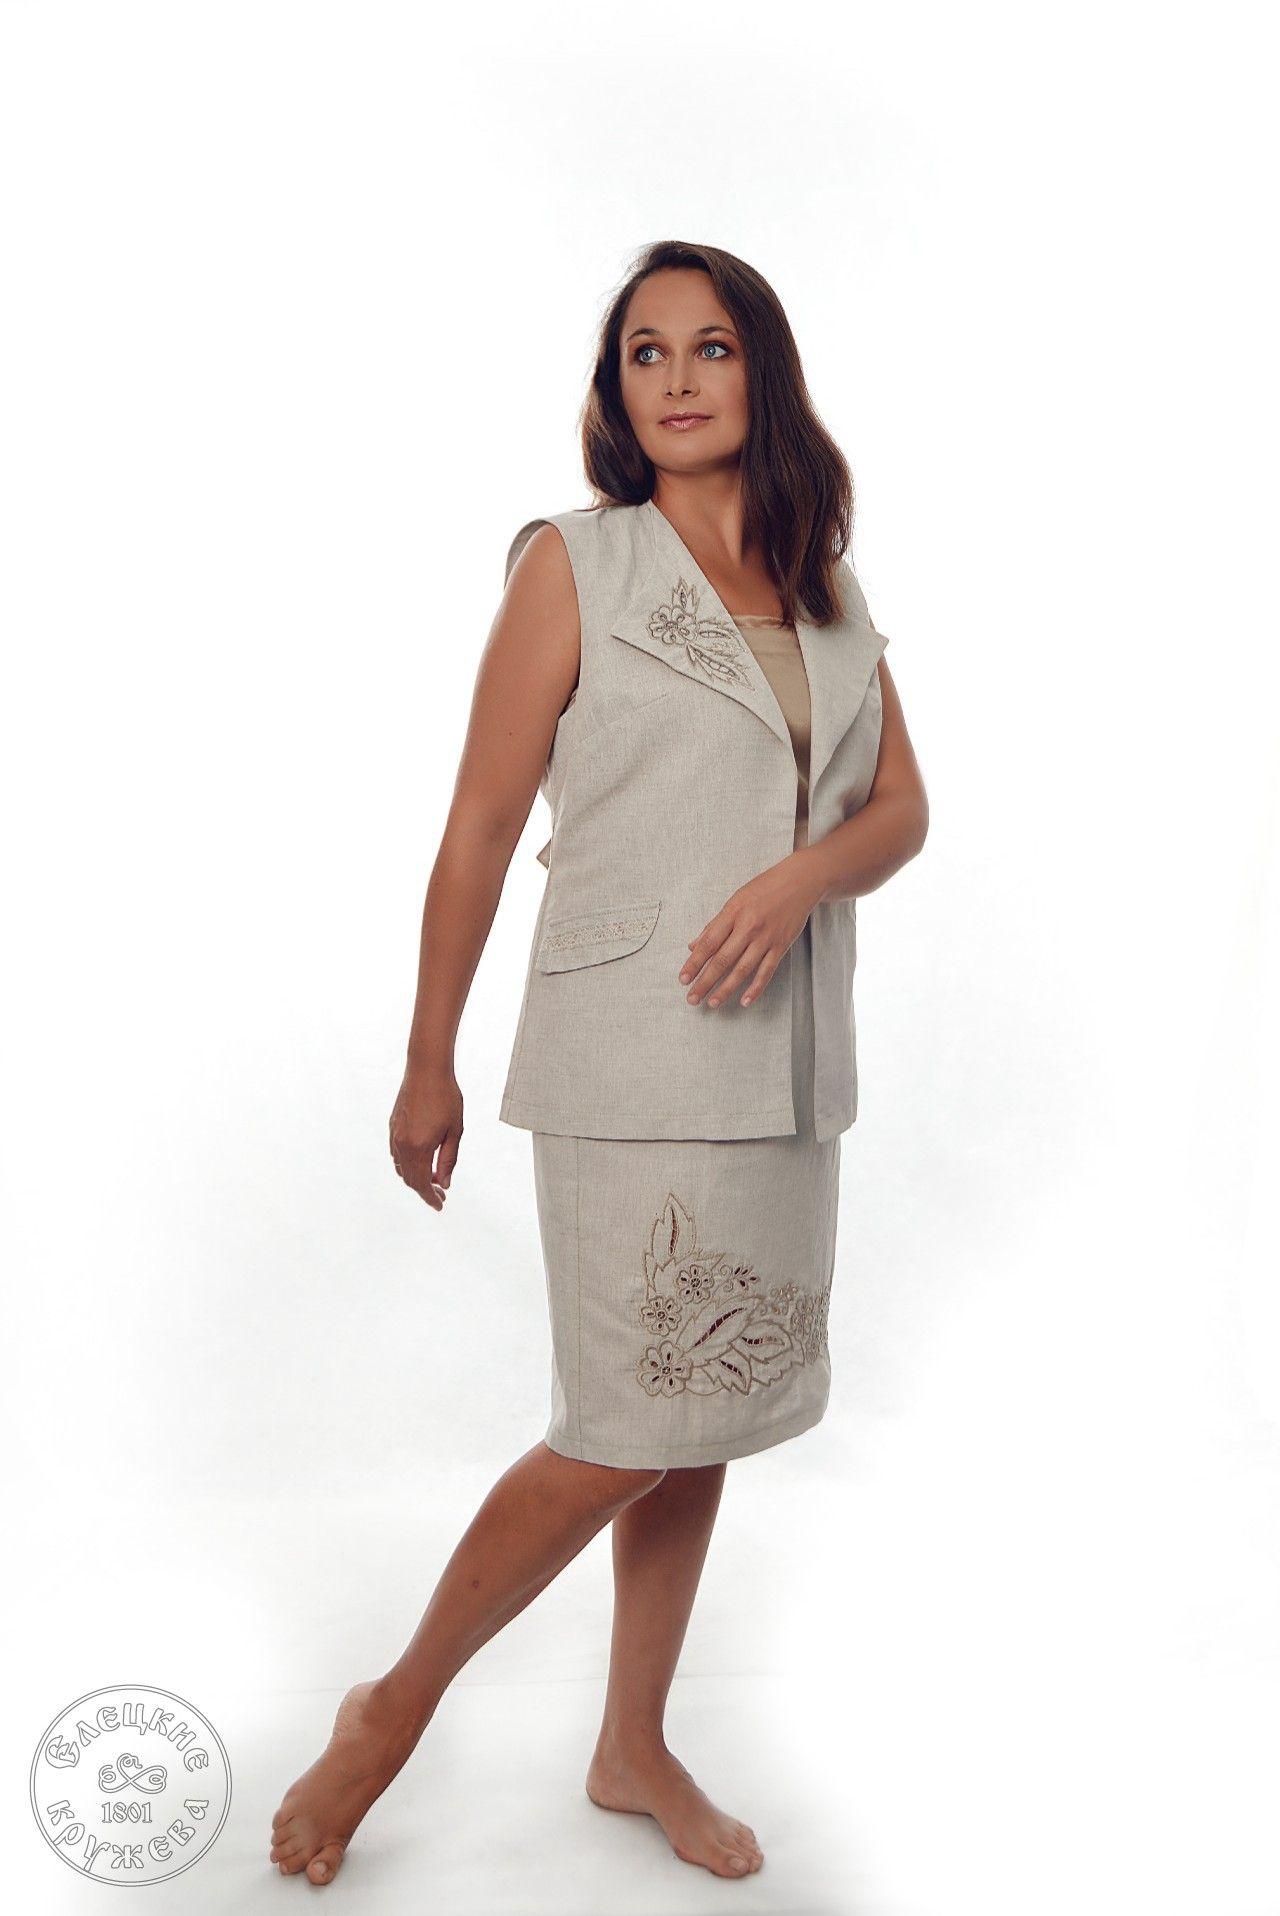 Yelets lace / Women's linen skirt С11726